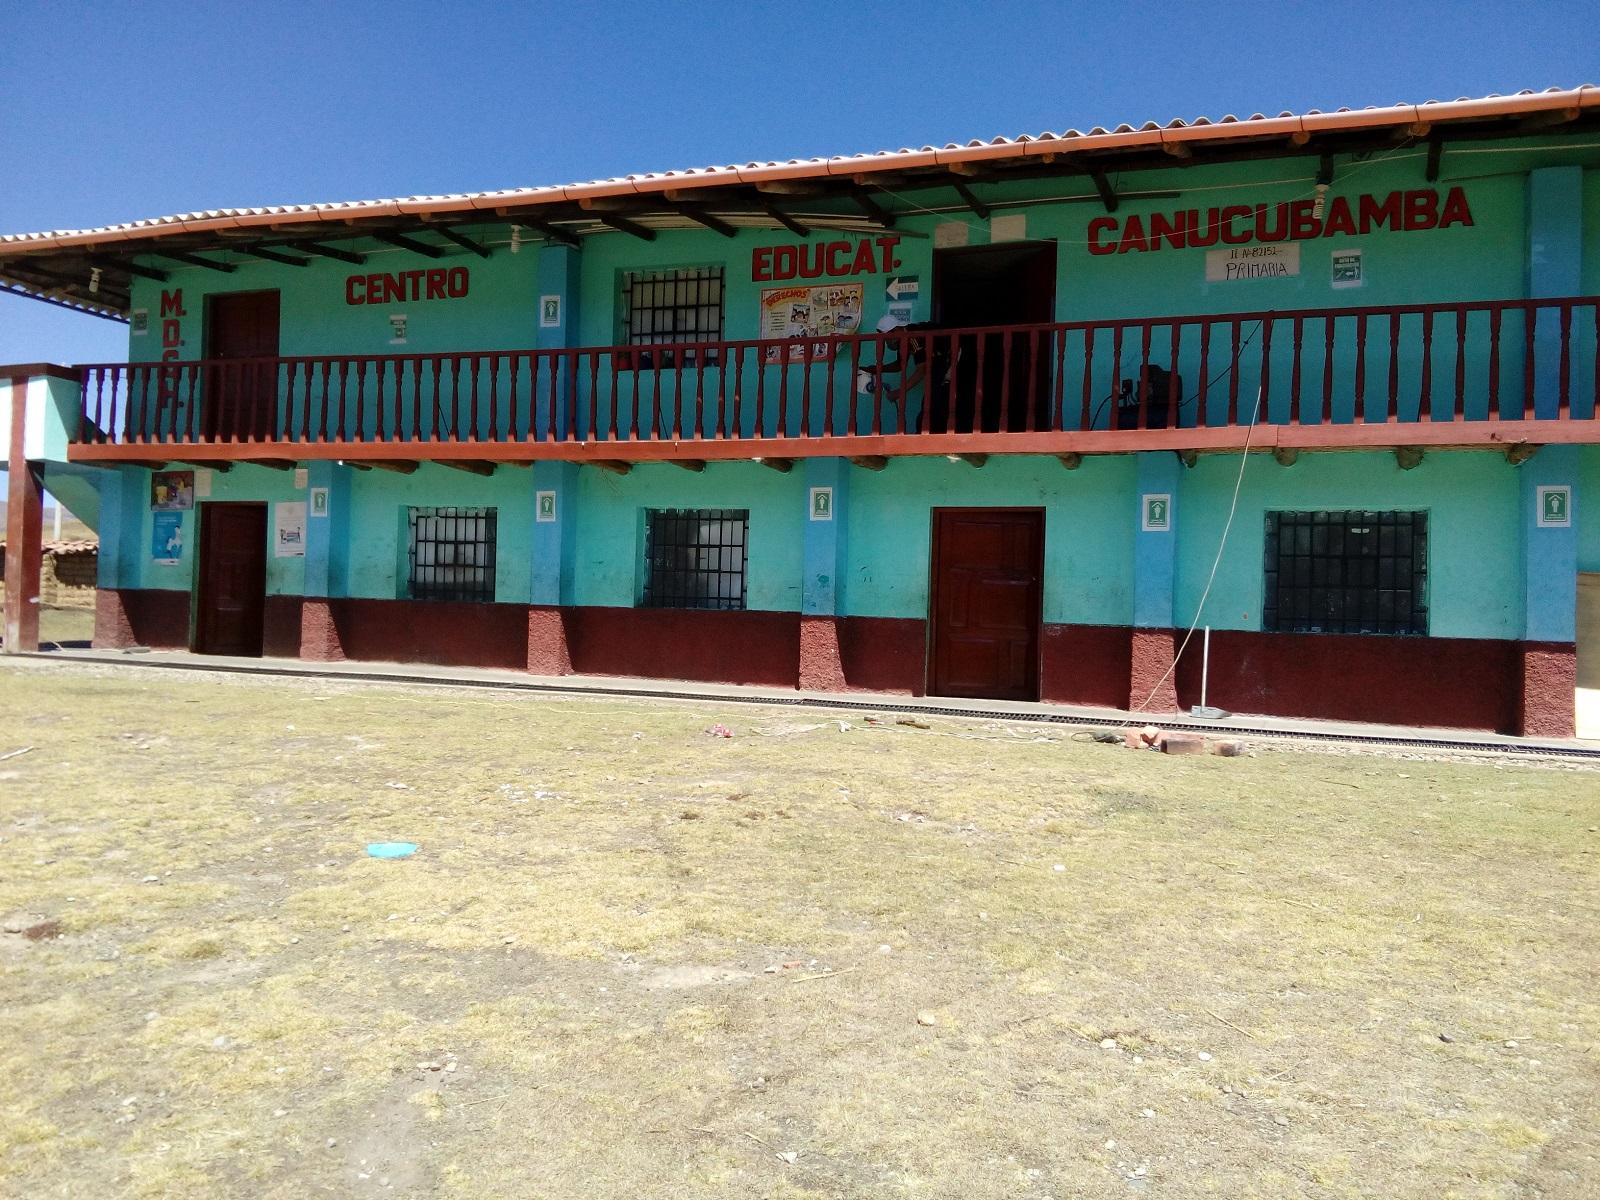 Escuela 82152 - Canucubamba